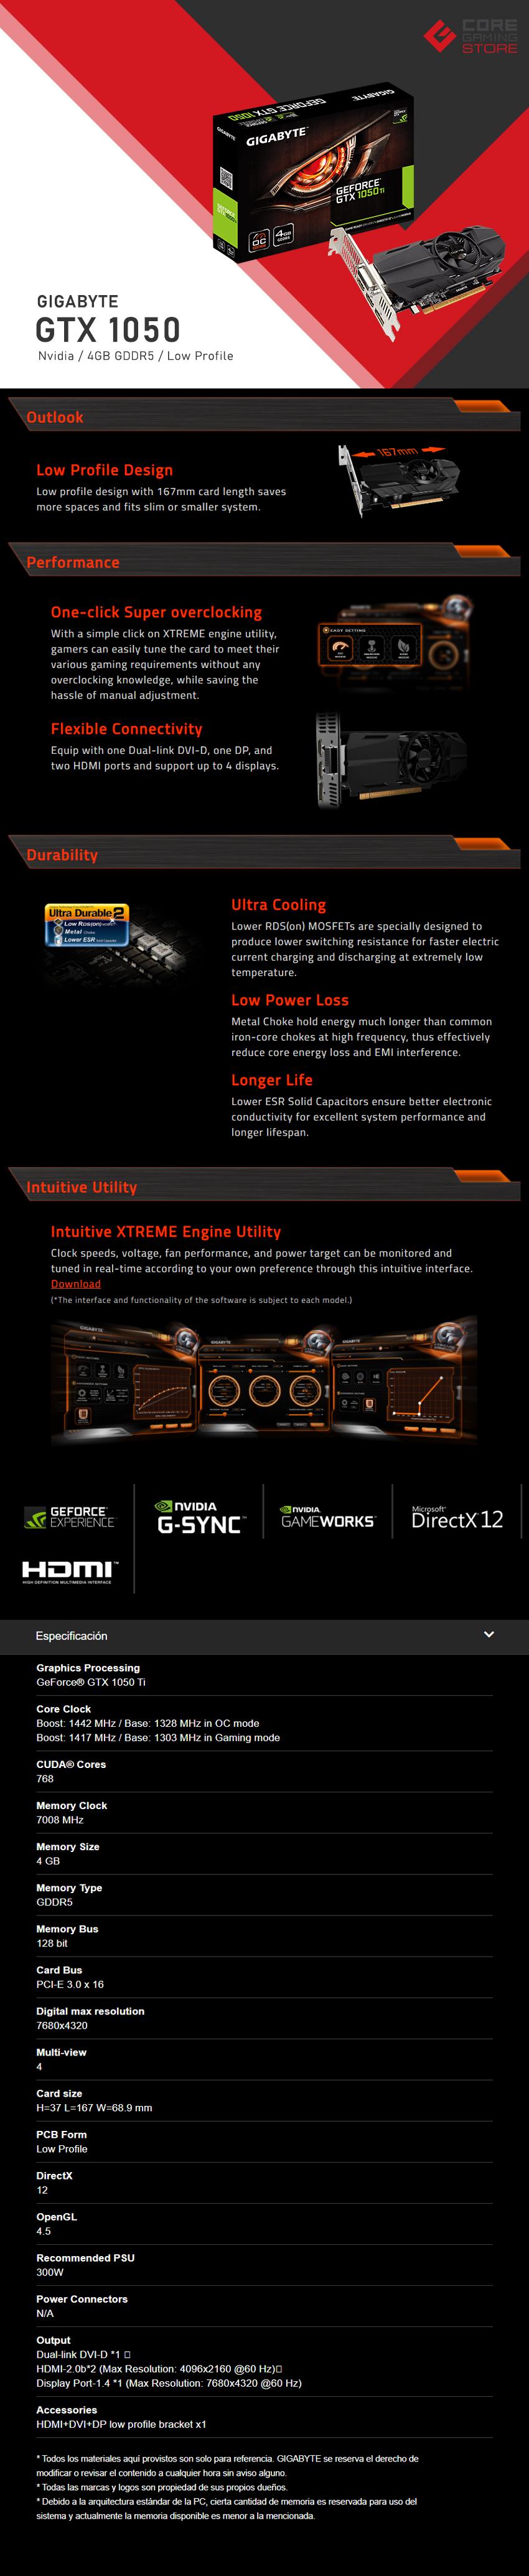 Tarjeta de Video Nvidia Gigabyte GTX 1050 Ti OC Low Profile, 4GB GDDR5, GV-N105TOK-4GL